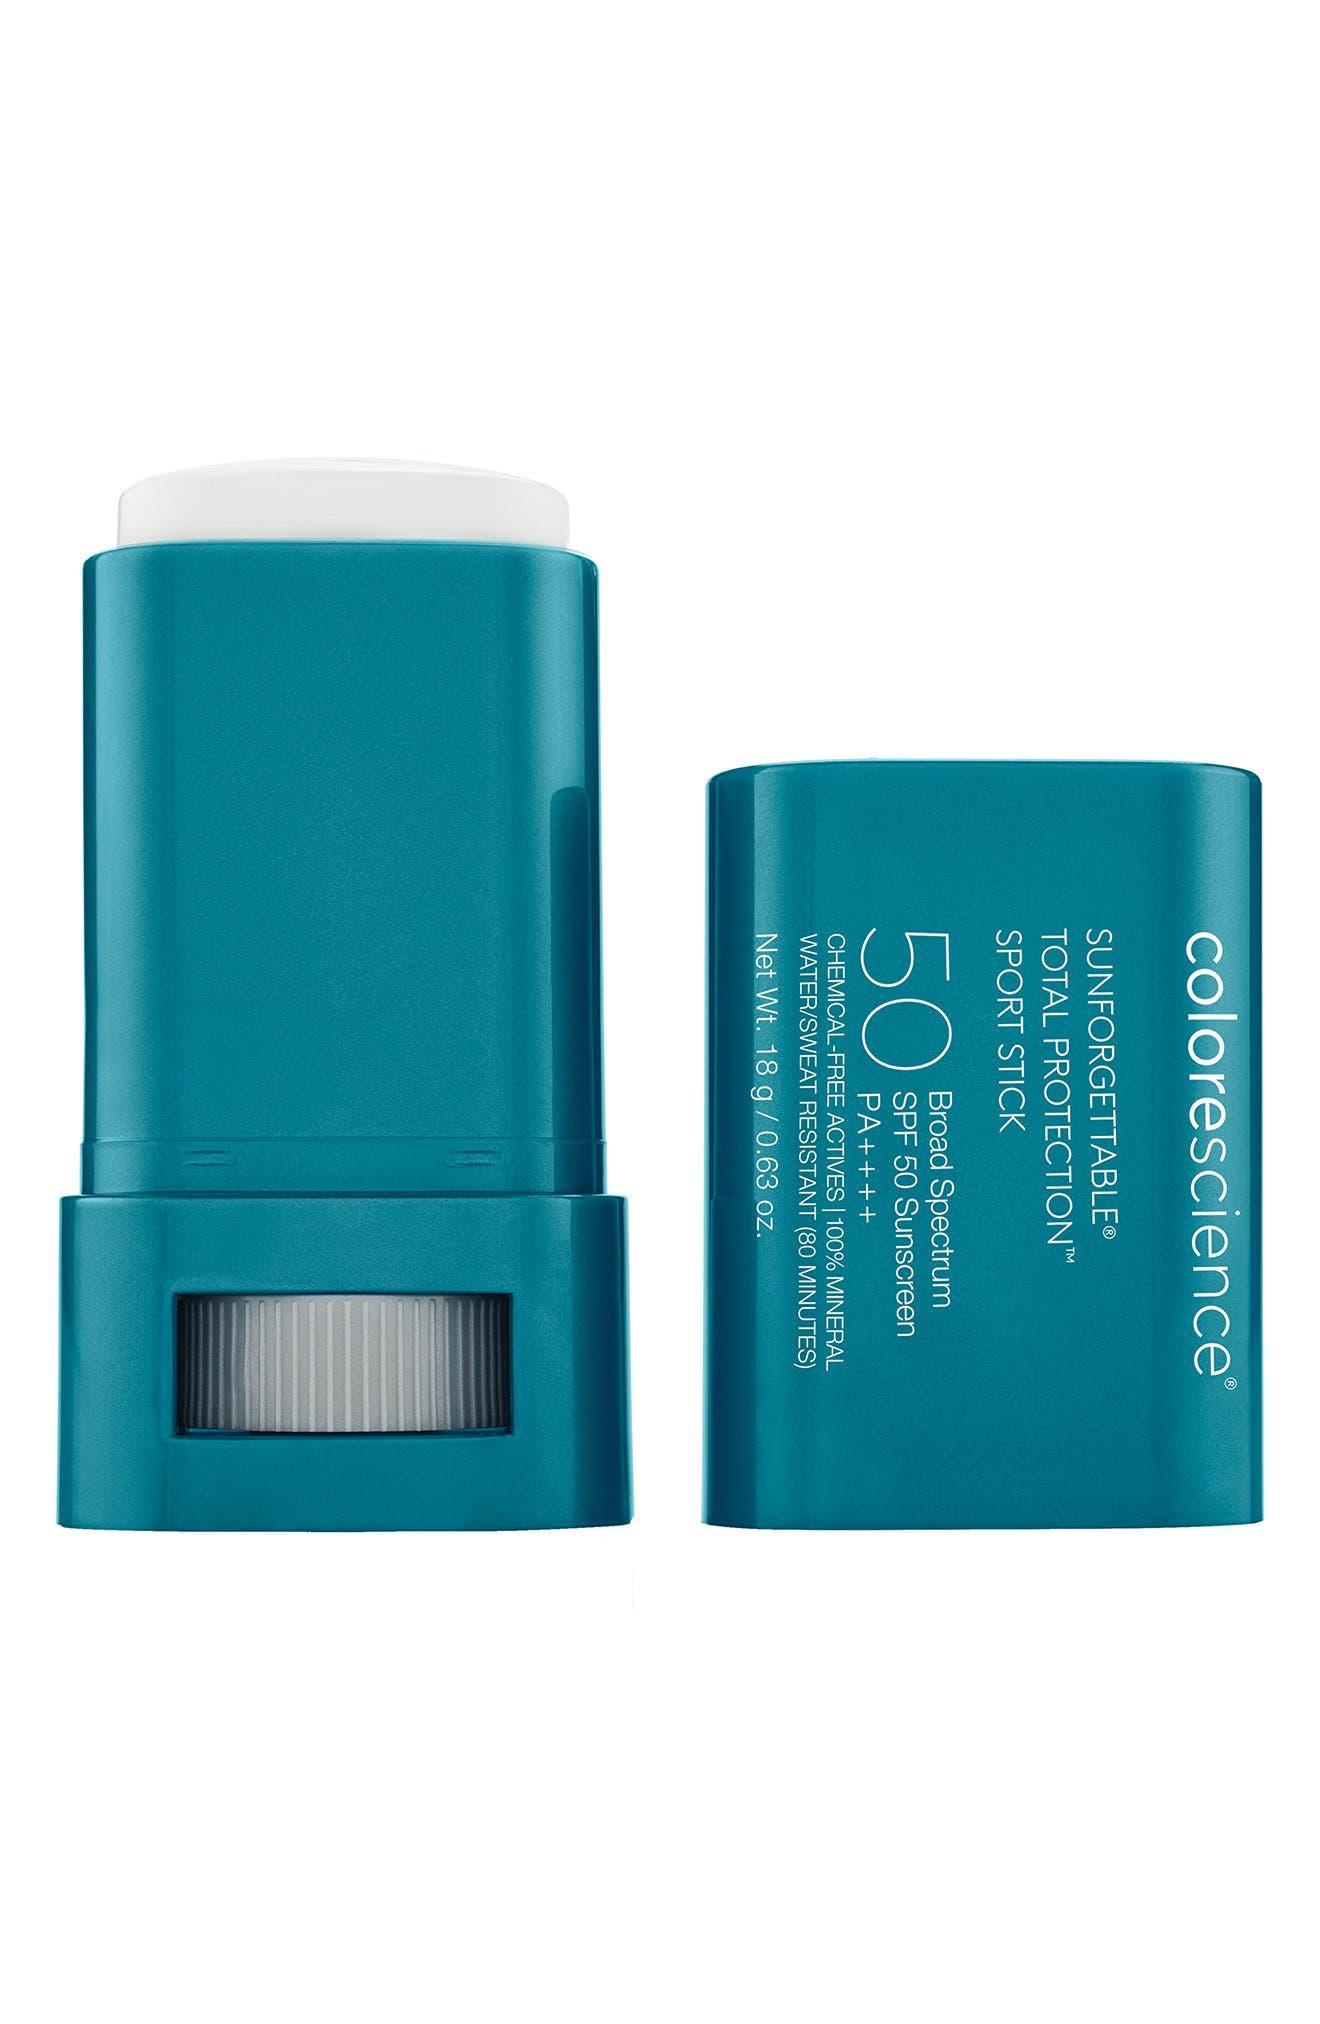 COLORESCIENCER Colorescience Sunforgettable Total Protection Sport Stick Spf 50 Sunscreen